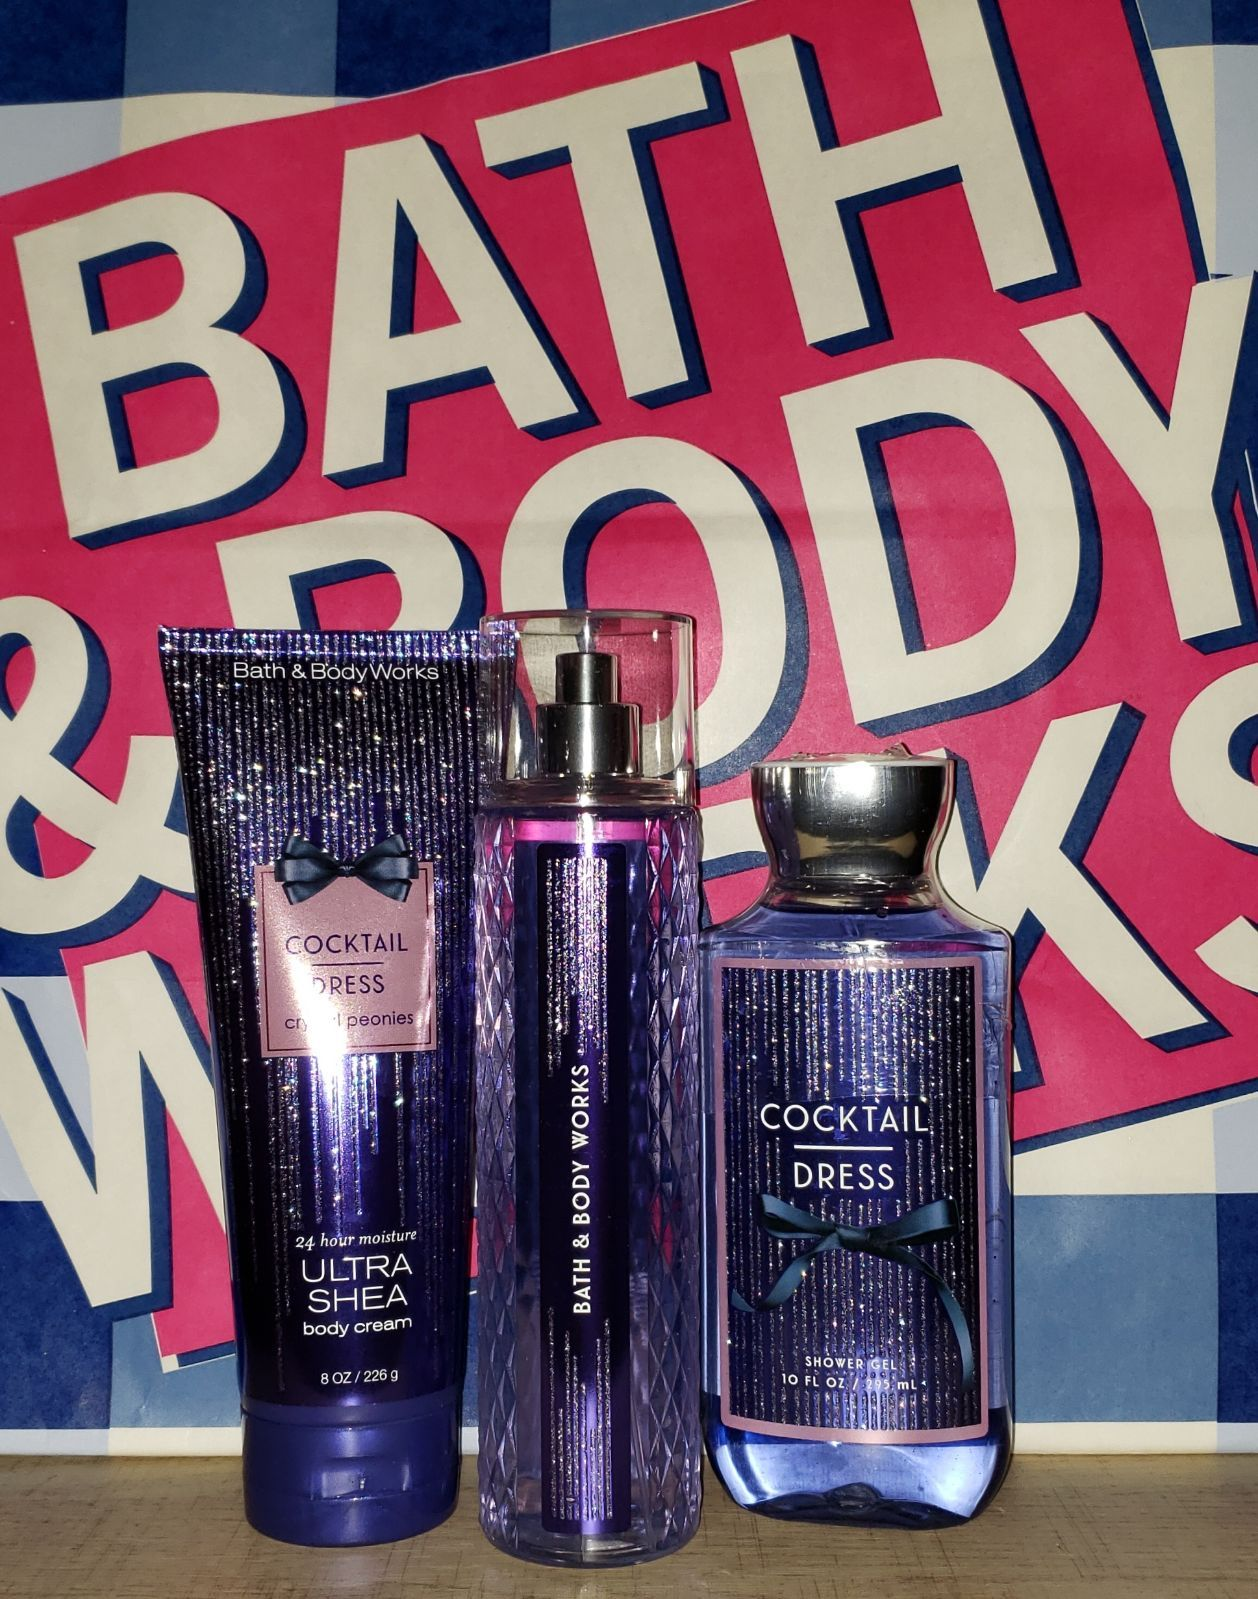 Bath Body Works Cocktail Dress 3 Piece Gift Set Set Includes Mist Body Cream Shower Gel Body Wash Bath And Body Works Bath And Body Body Cream [ 1599 x 1258 Pixel ]